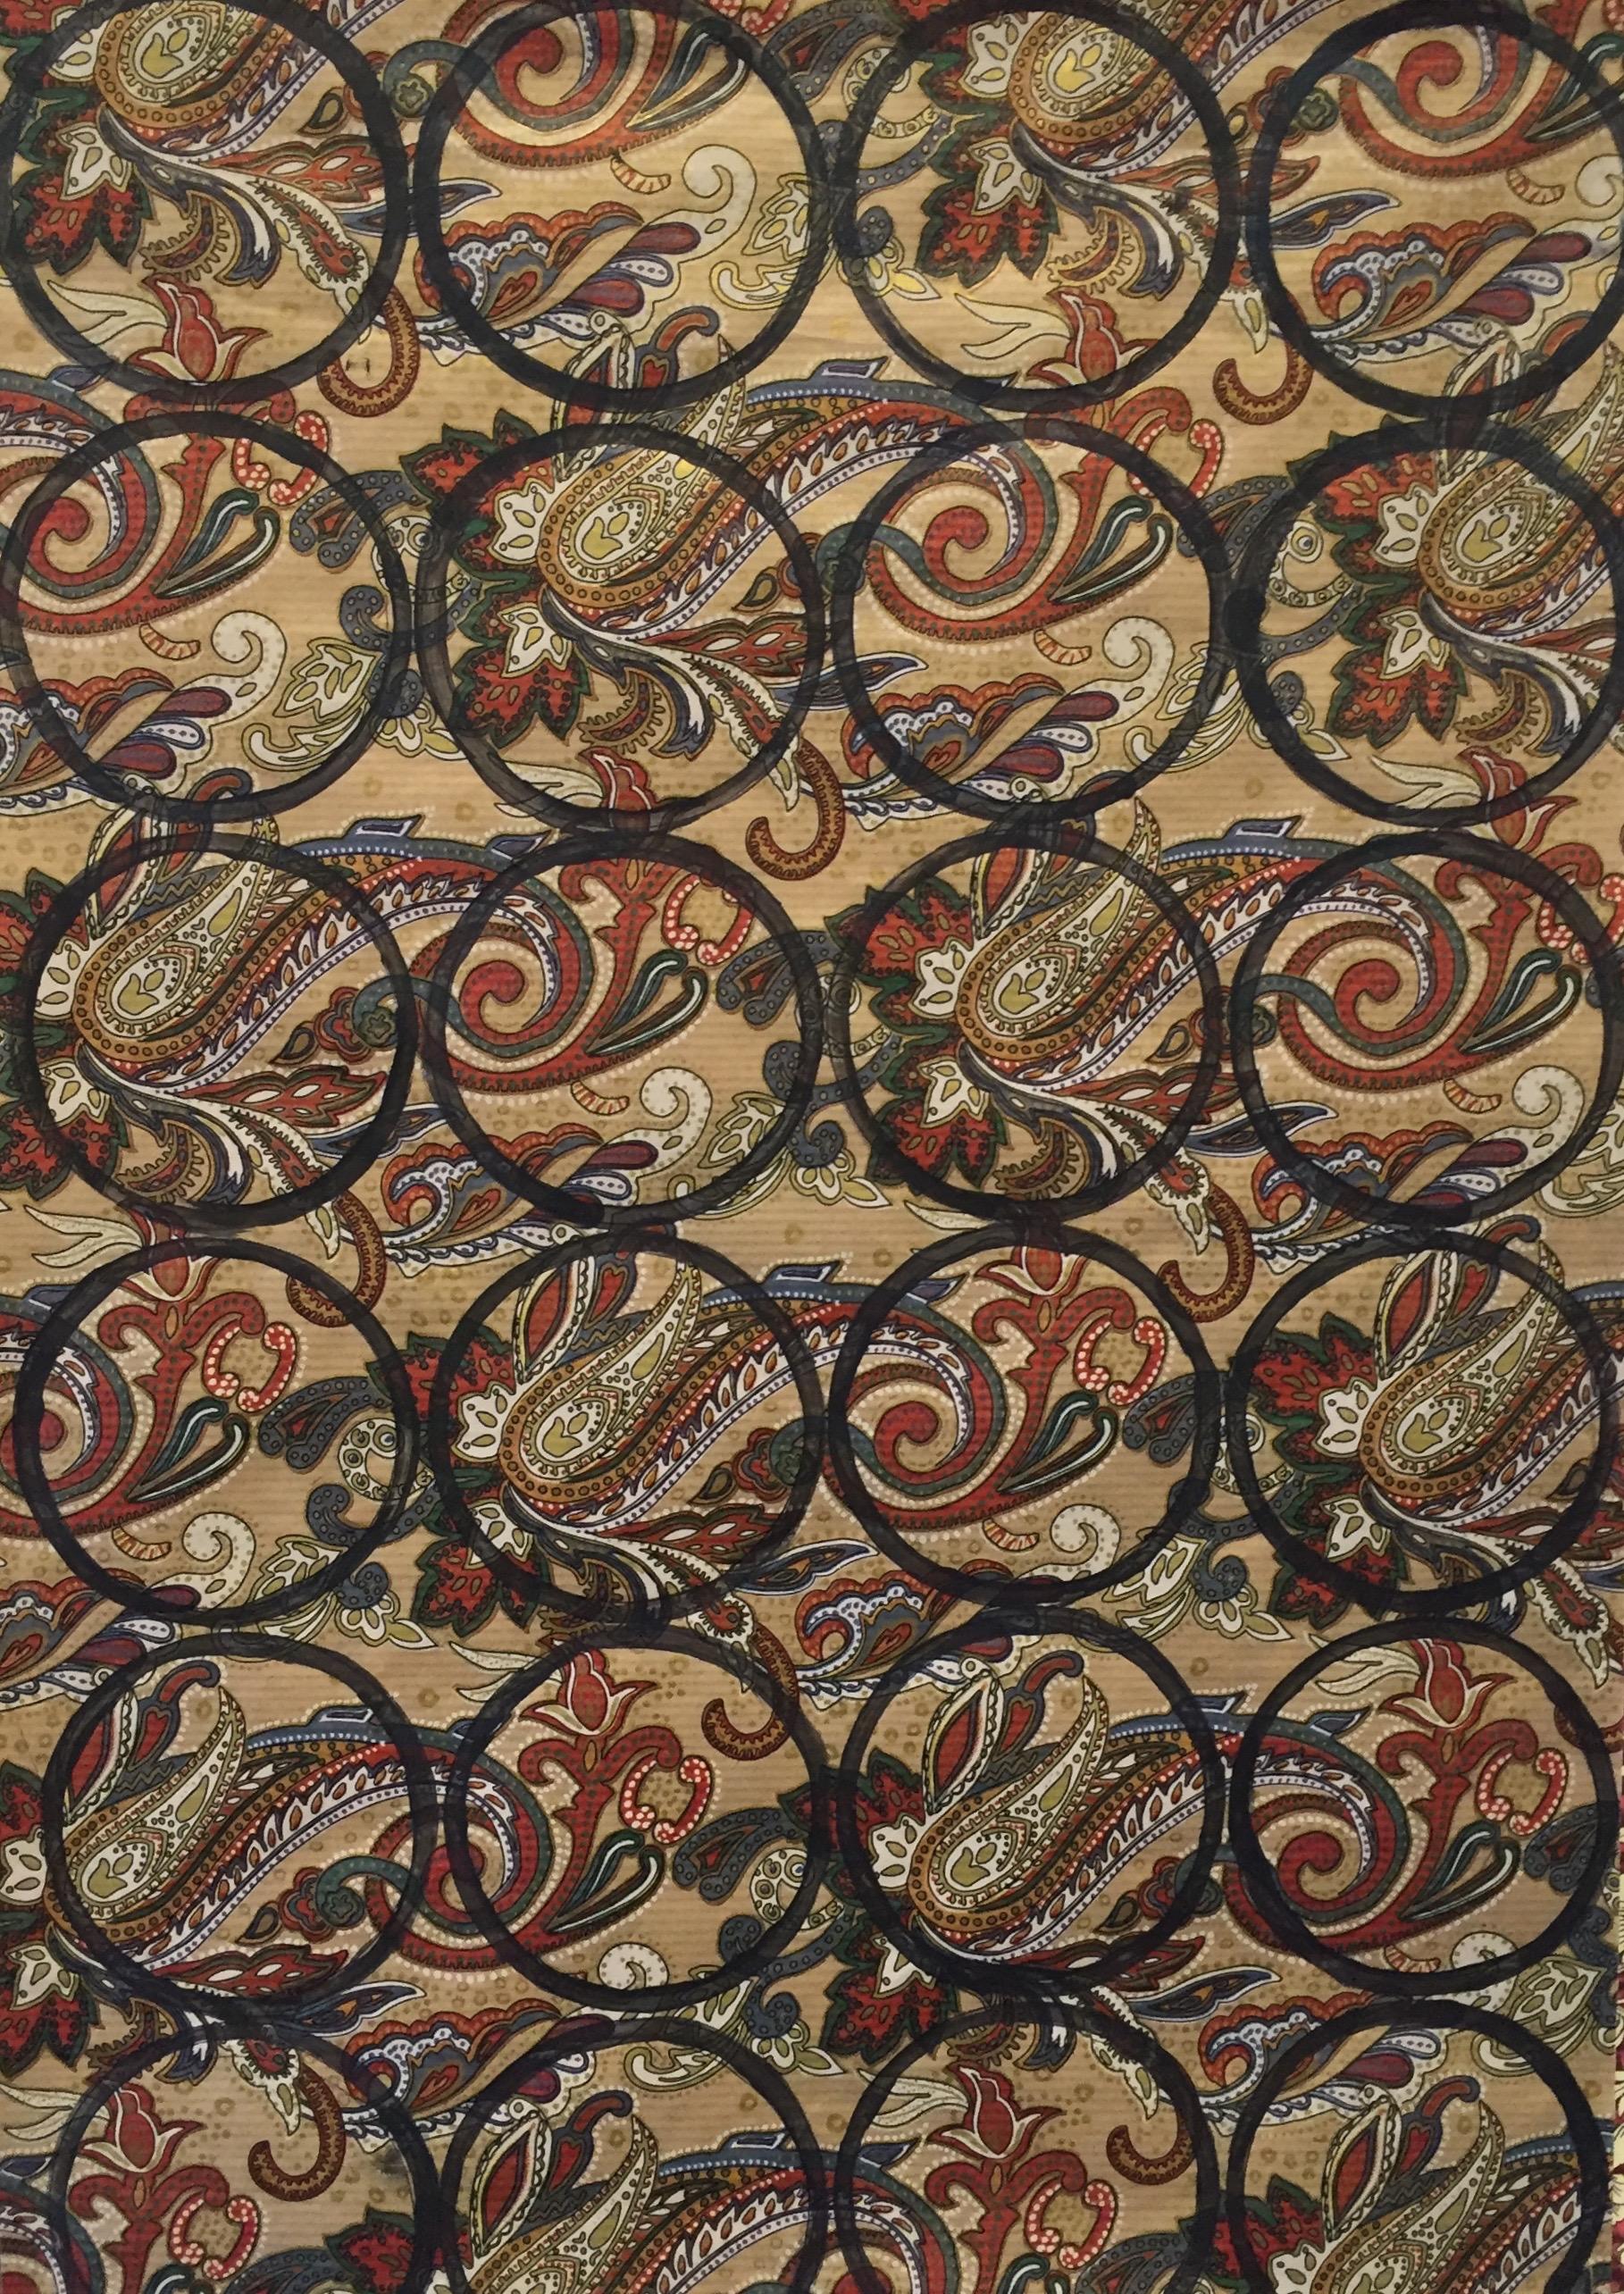 MINAA MOHSIN   Untitled - detail   mixed media on paper